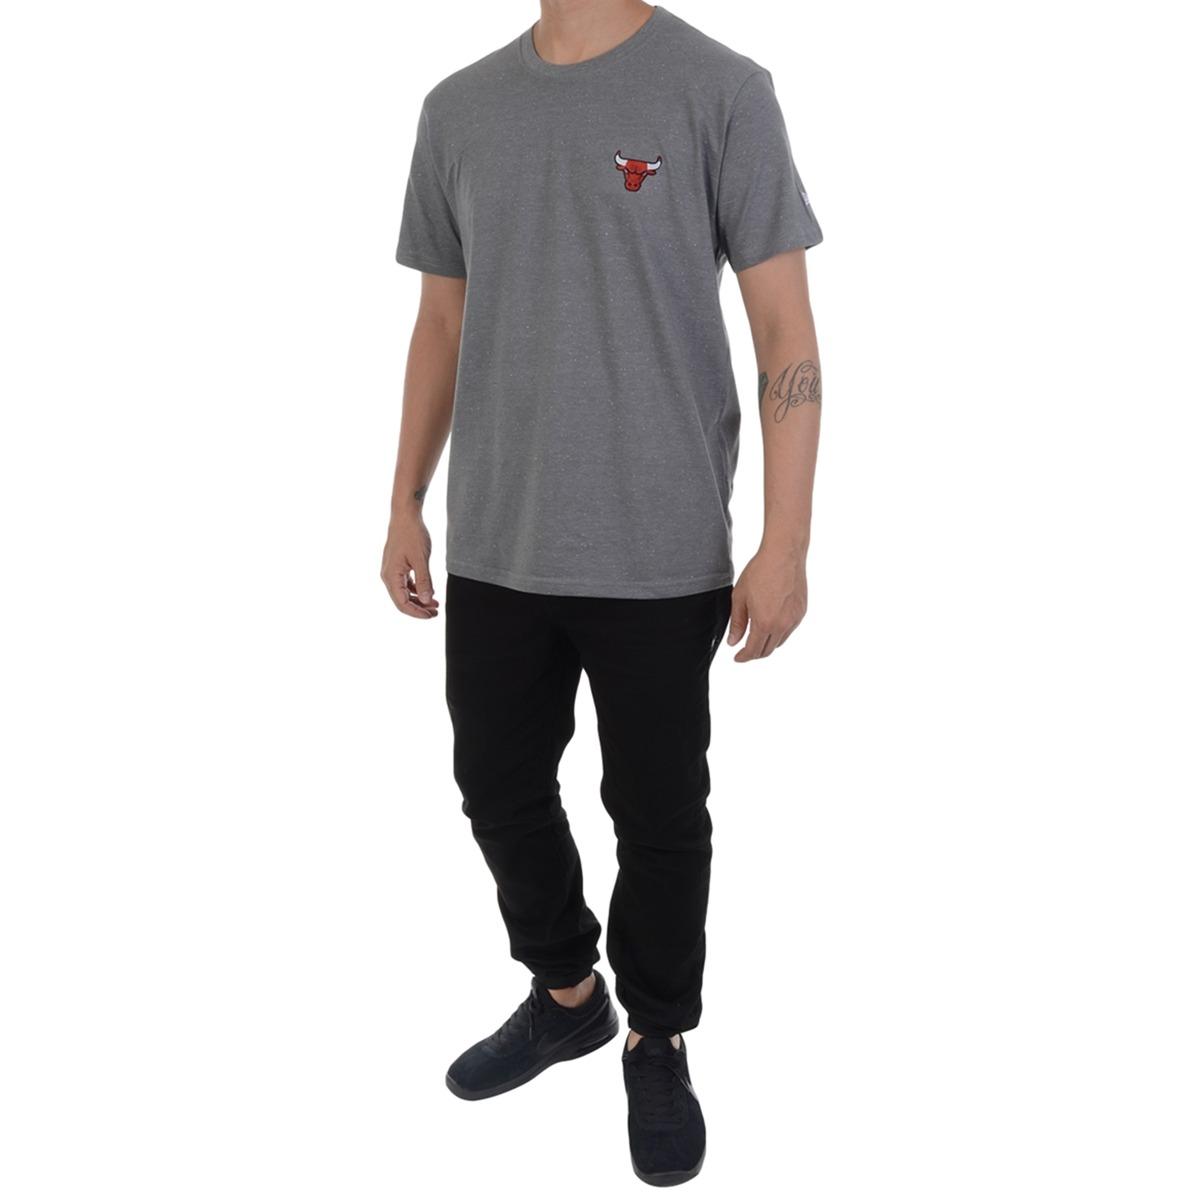 2ee1af5161 Camiseta New Era Chicago Bulls Nba Chumbo - R  69